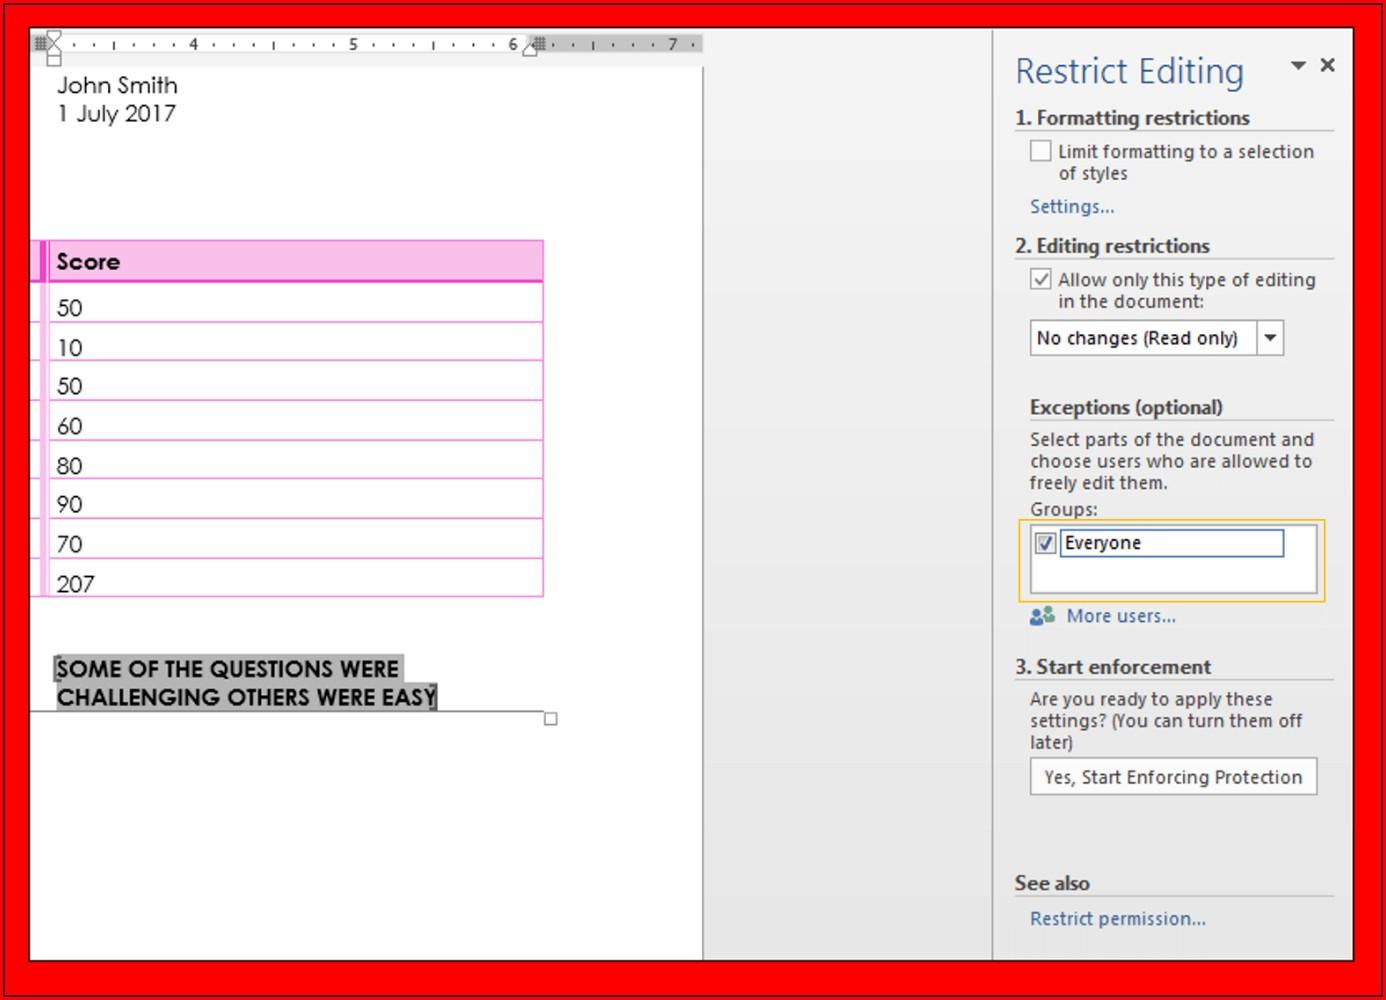 Delete Worksheet Vba Without Warning